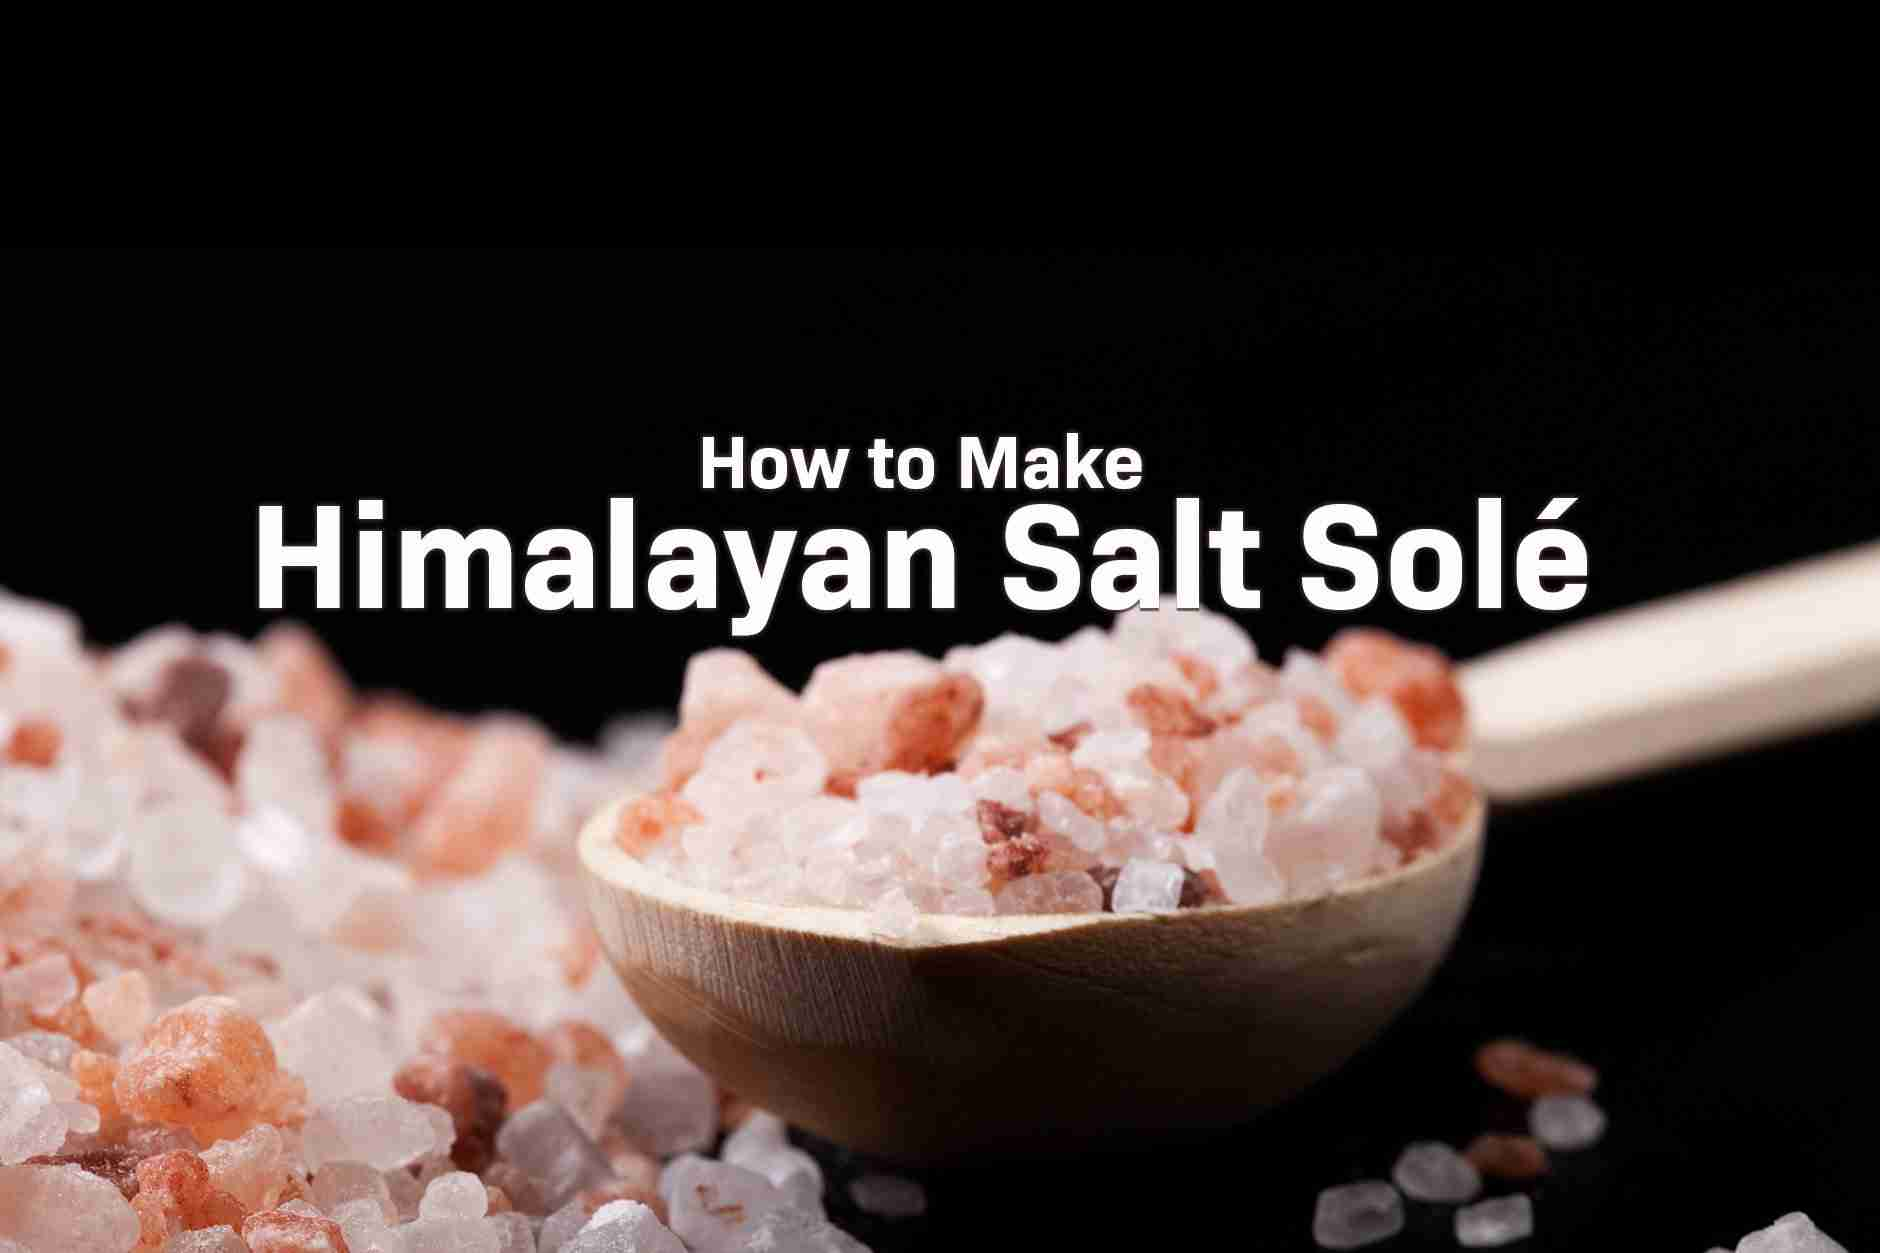 how to make himalayan salt sole